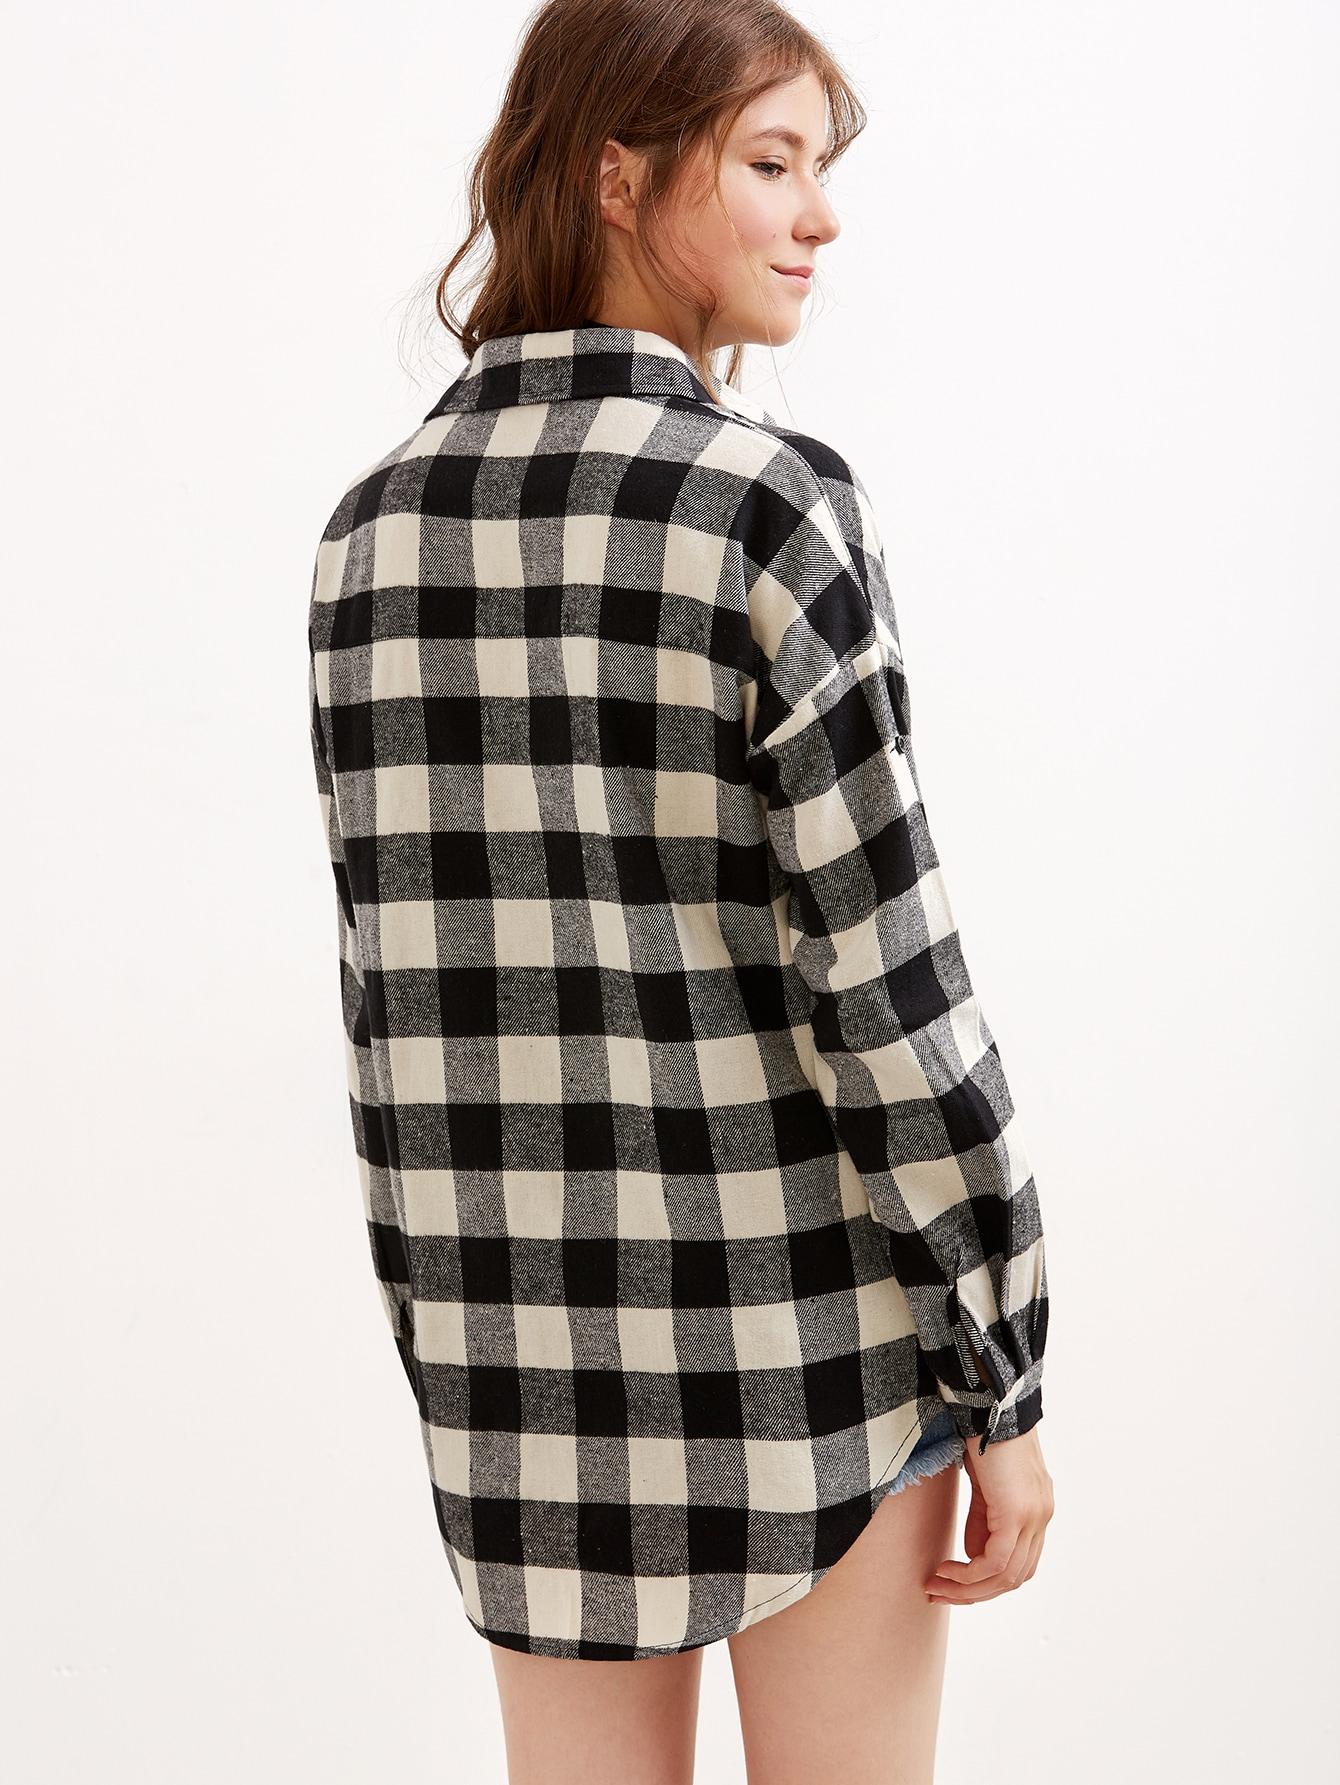 blouse160823321_2